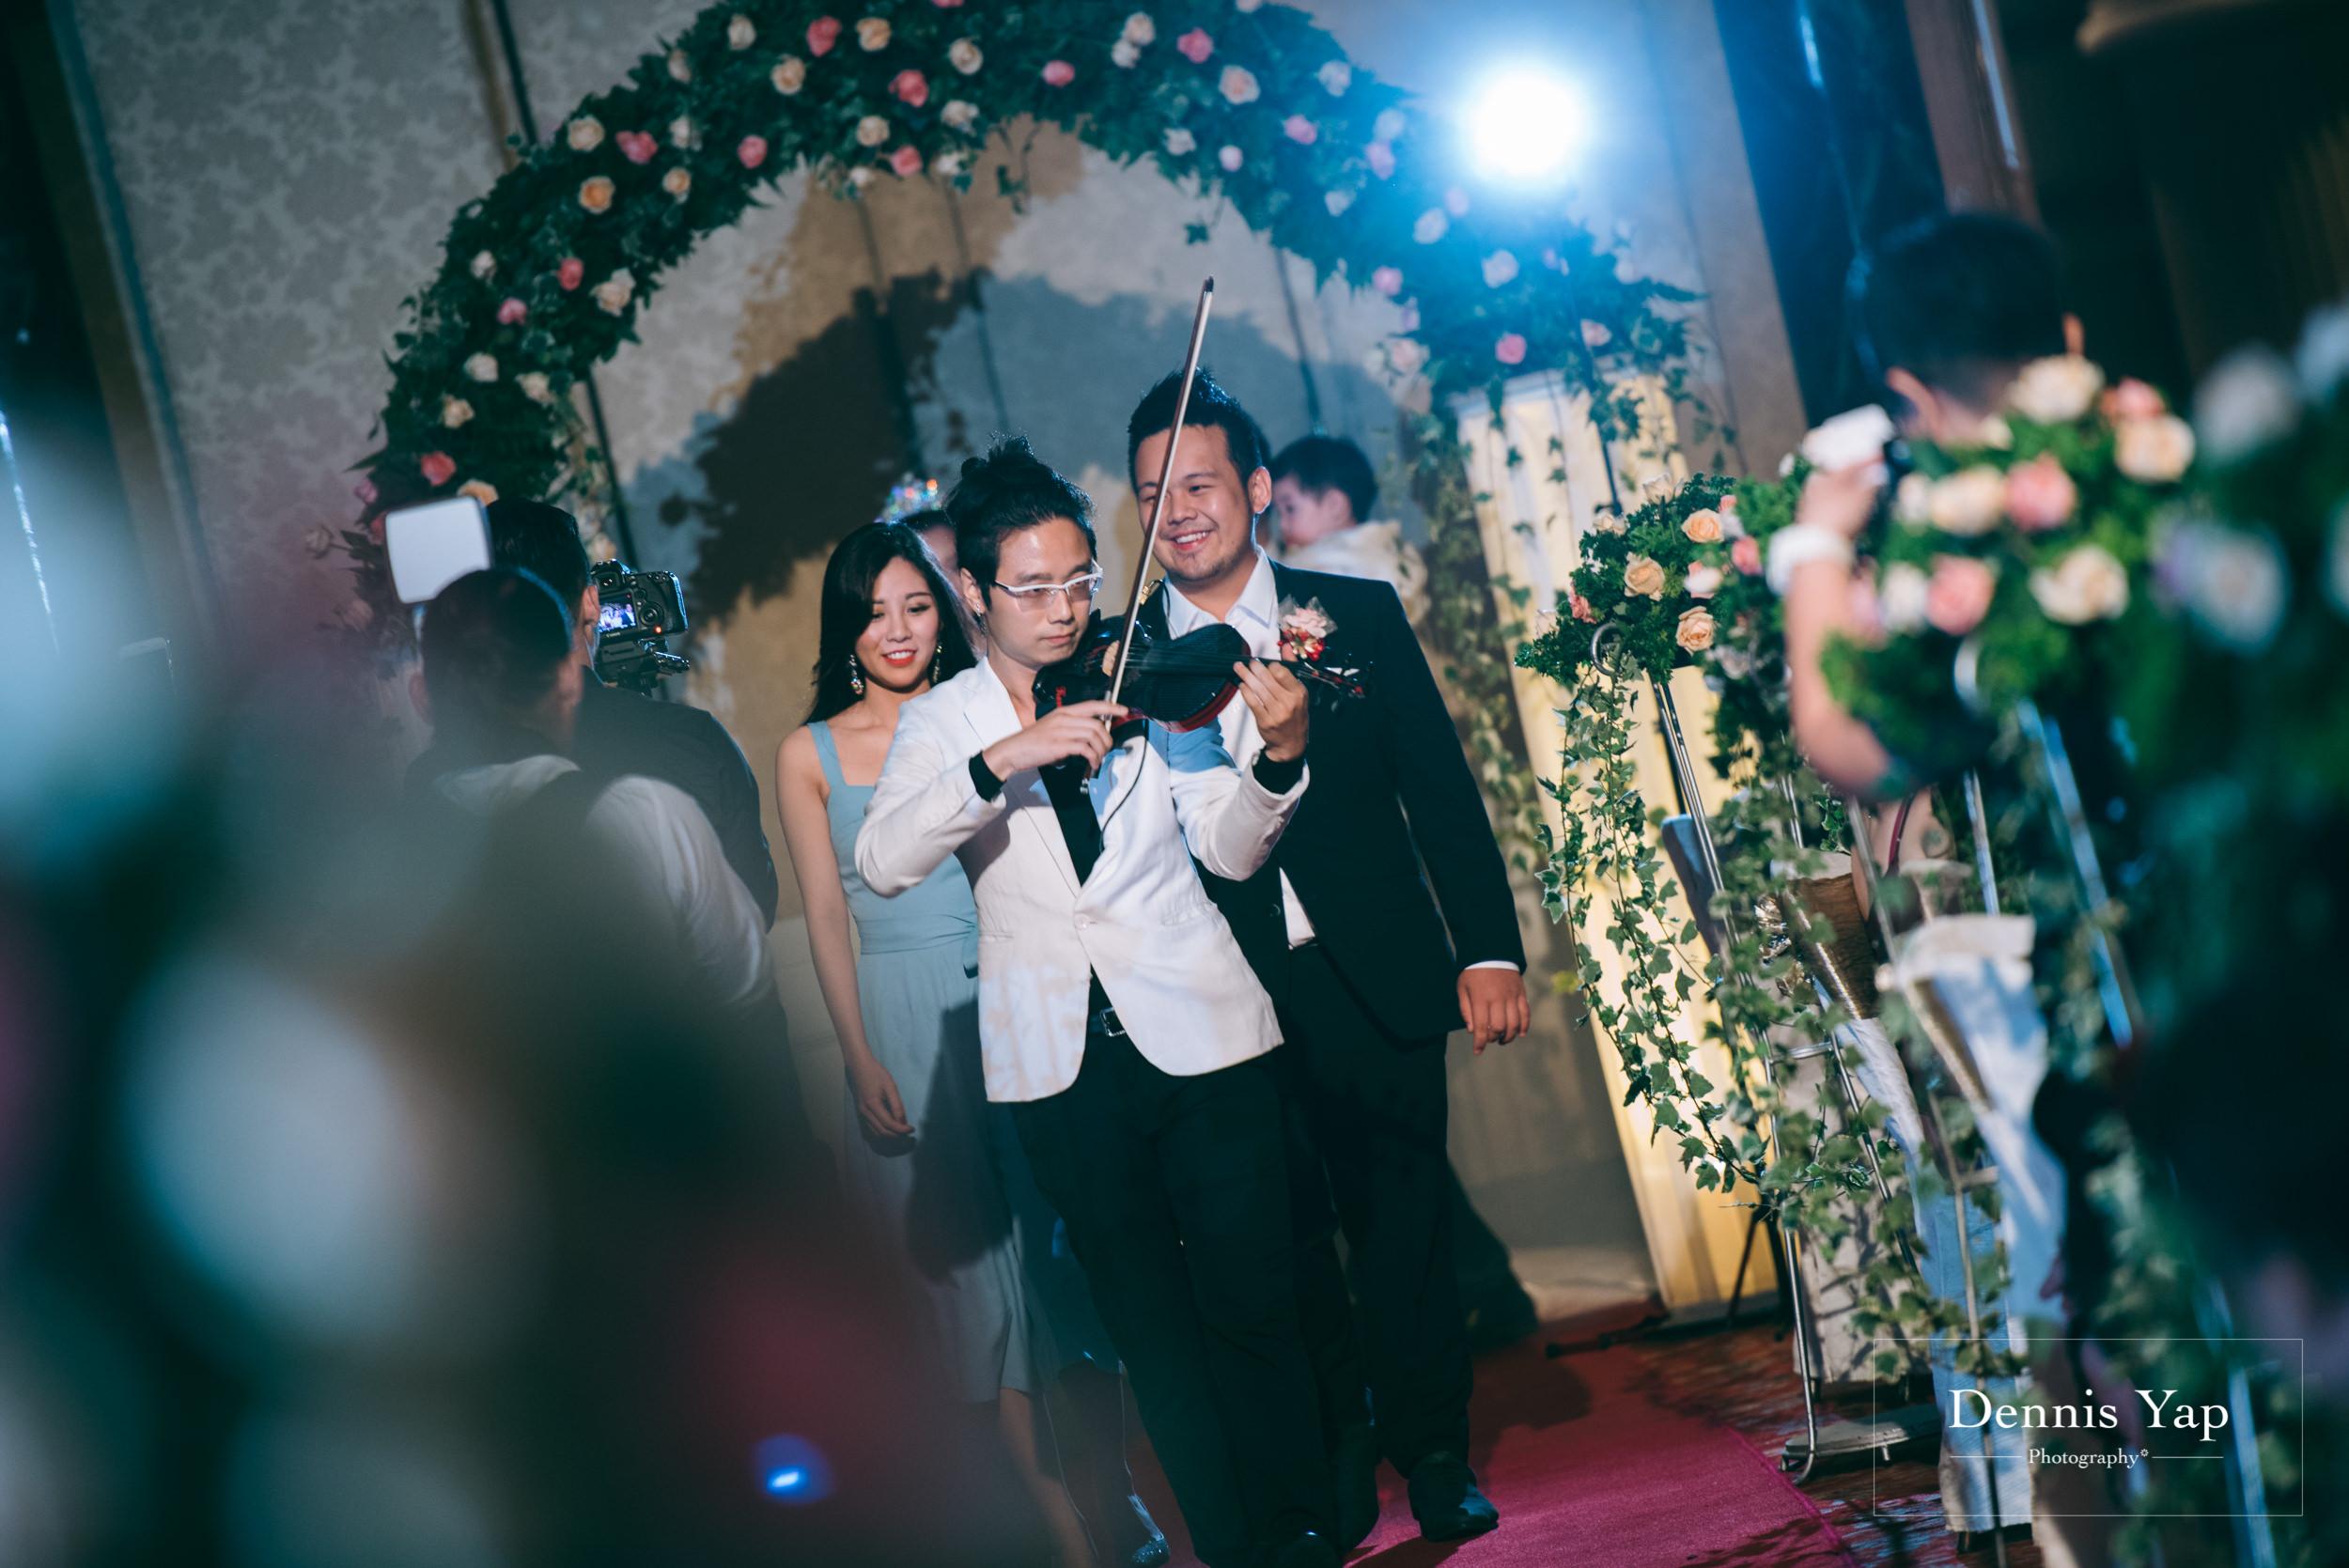 ivan constance wedding day renaissance hotel dennis yap photography-35.jpg